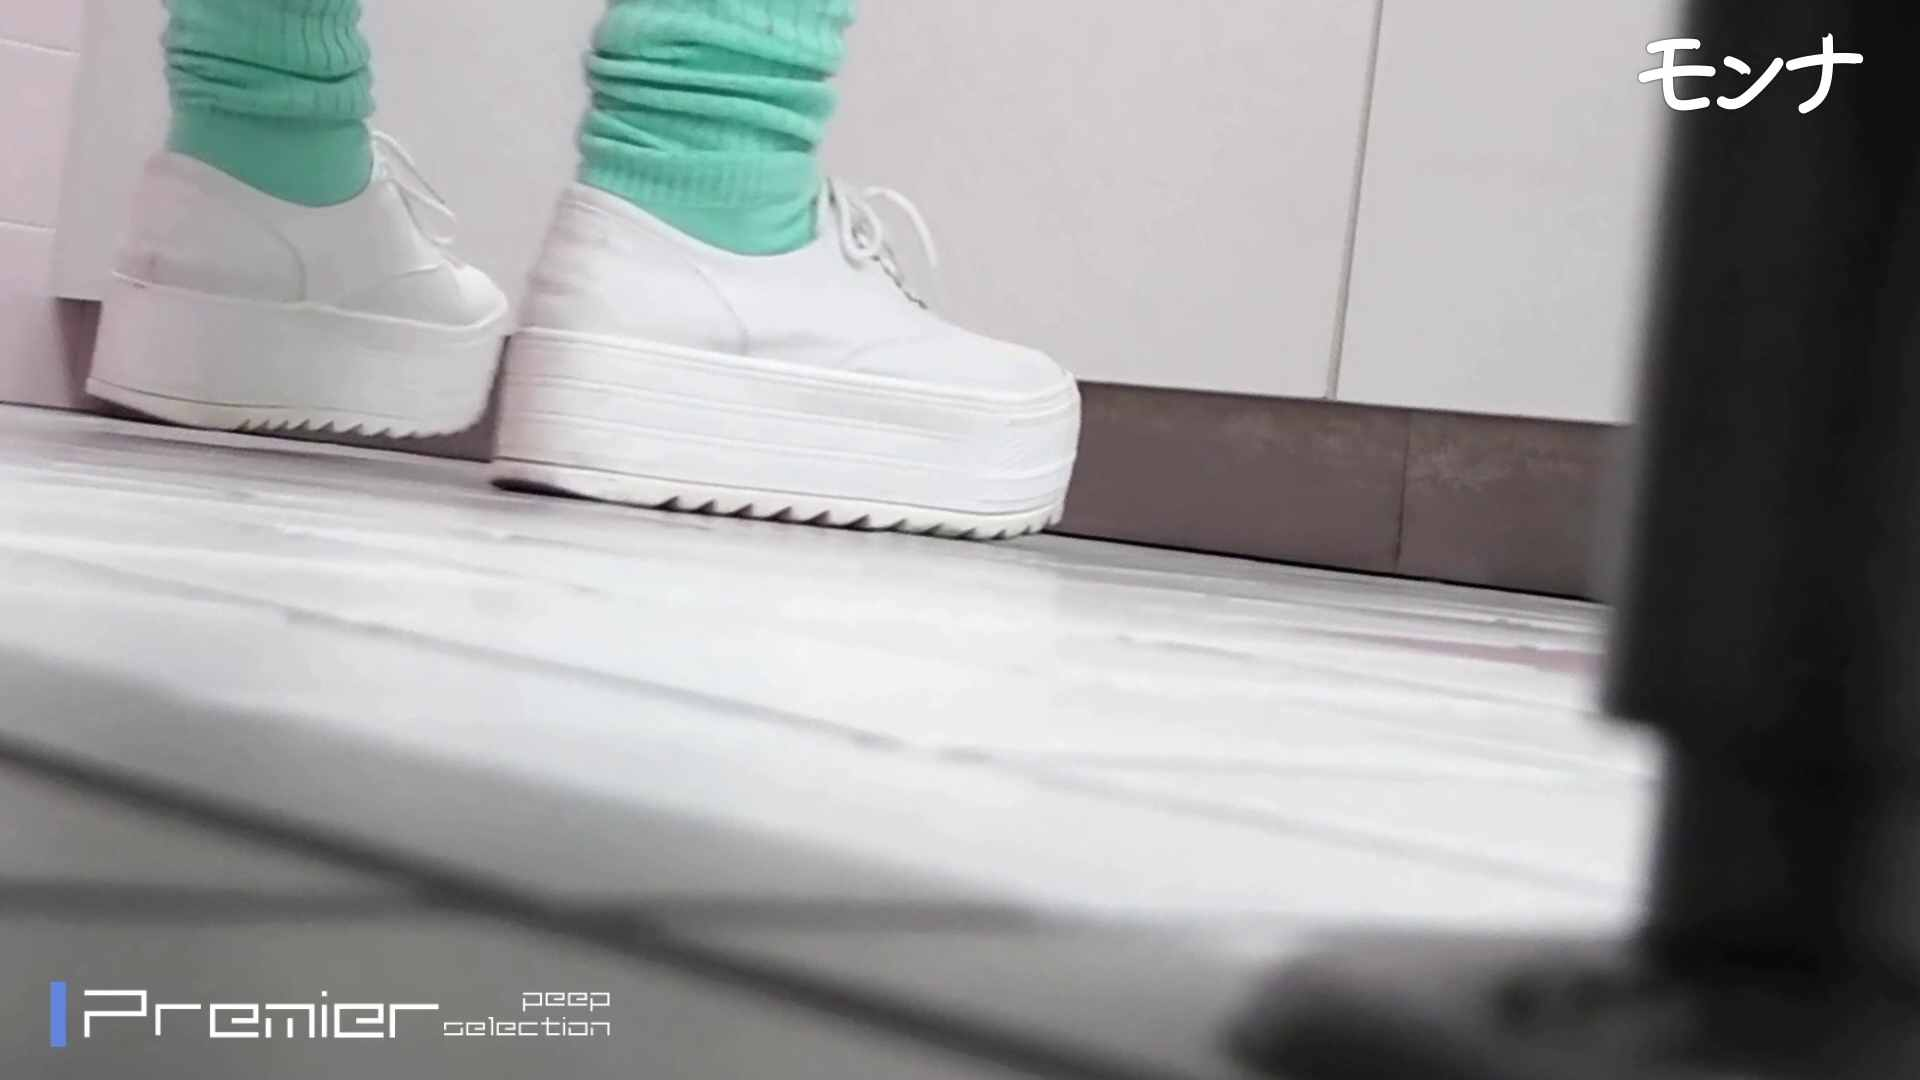 CM 悶絶シリーズ5 【美しい日本の未来 No.128】 盛合せ 濡れ場動画紹介 111枚 13